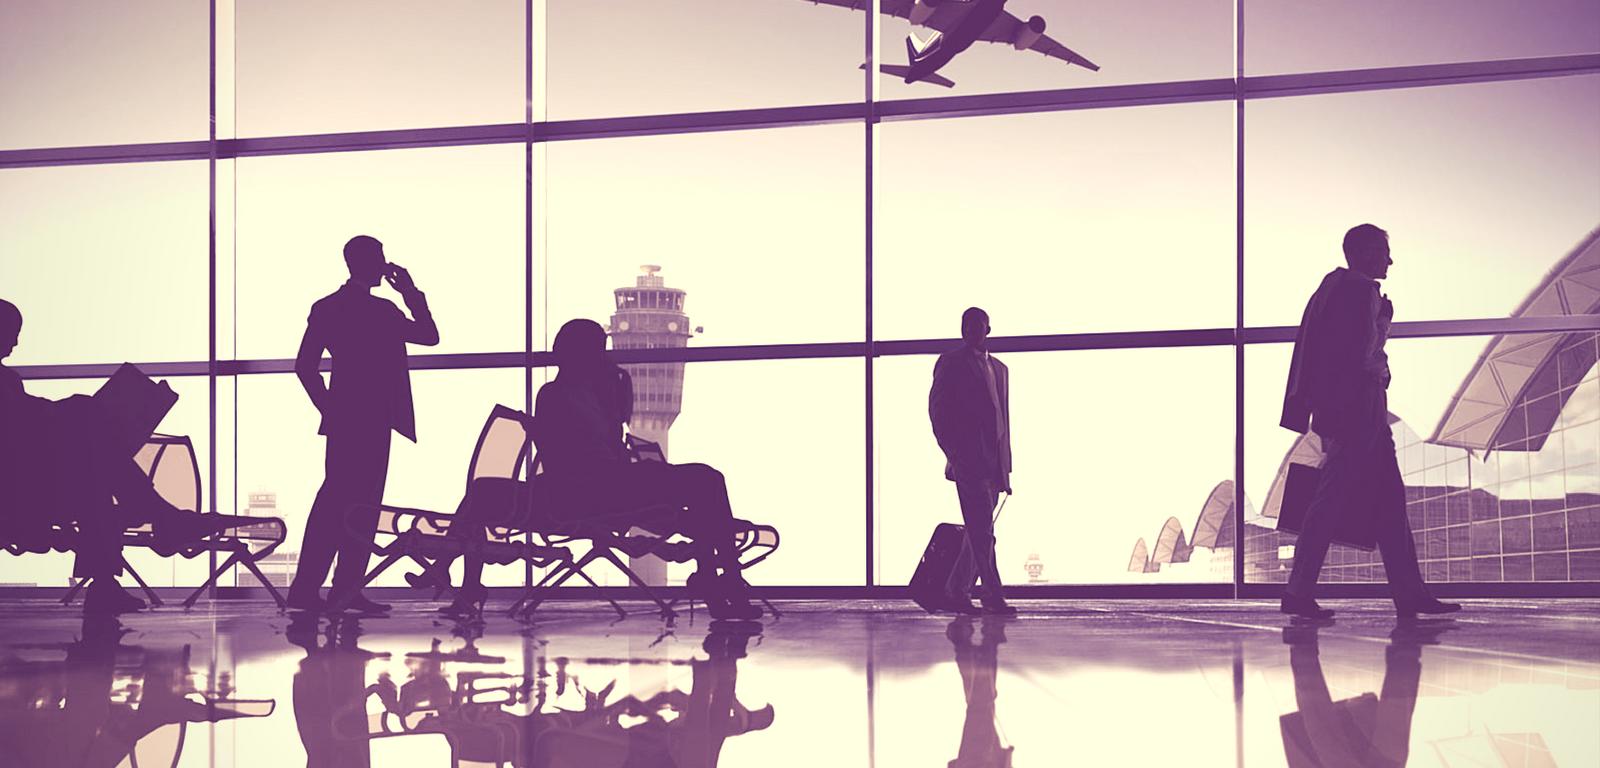 Image for Corporate Tours & Adventure Tours Operators